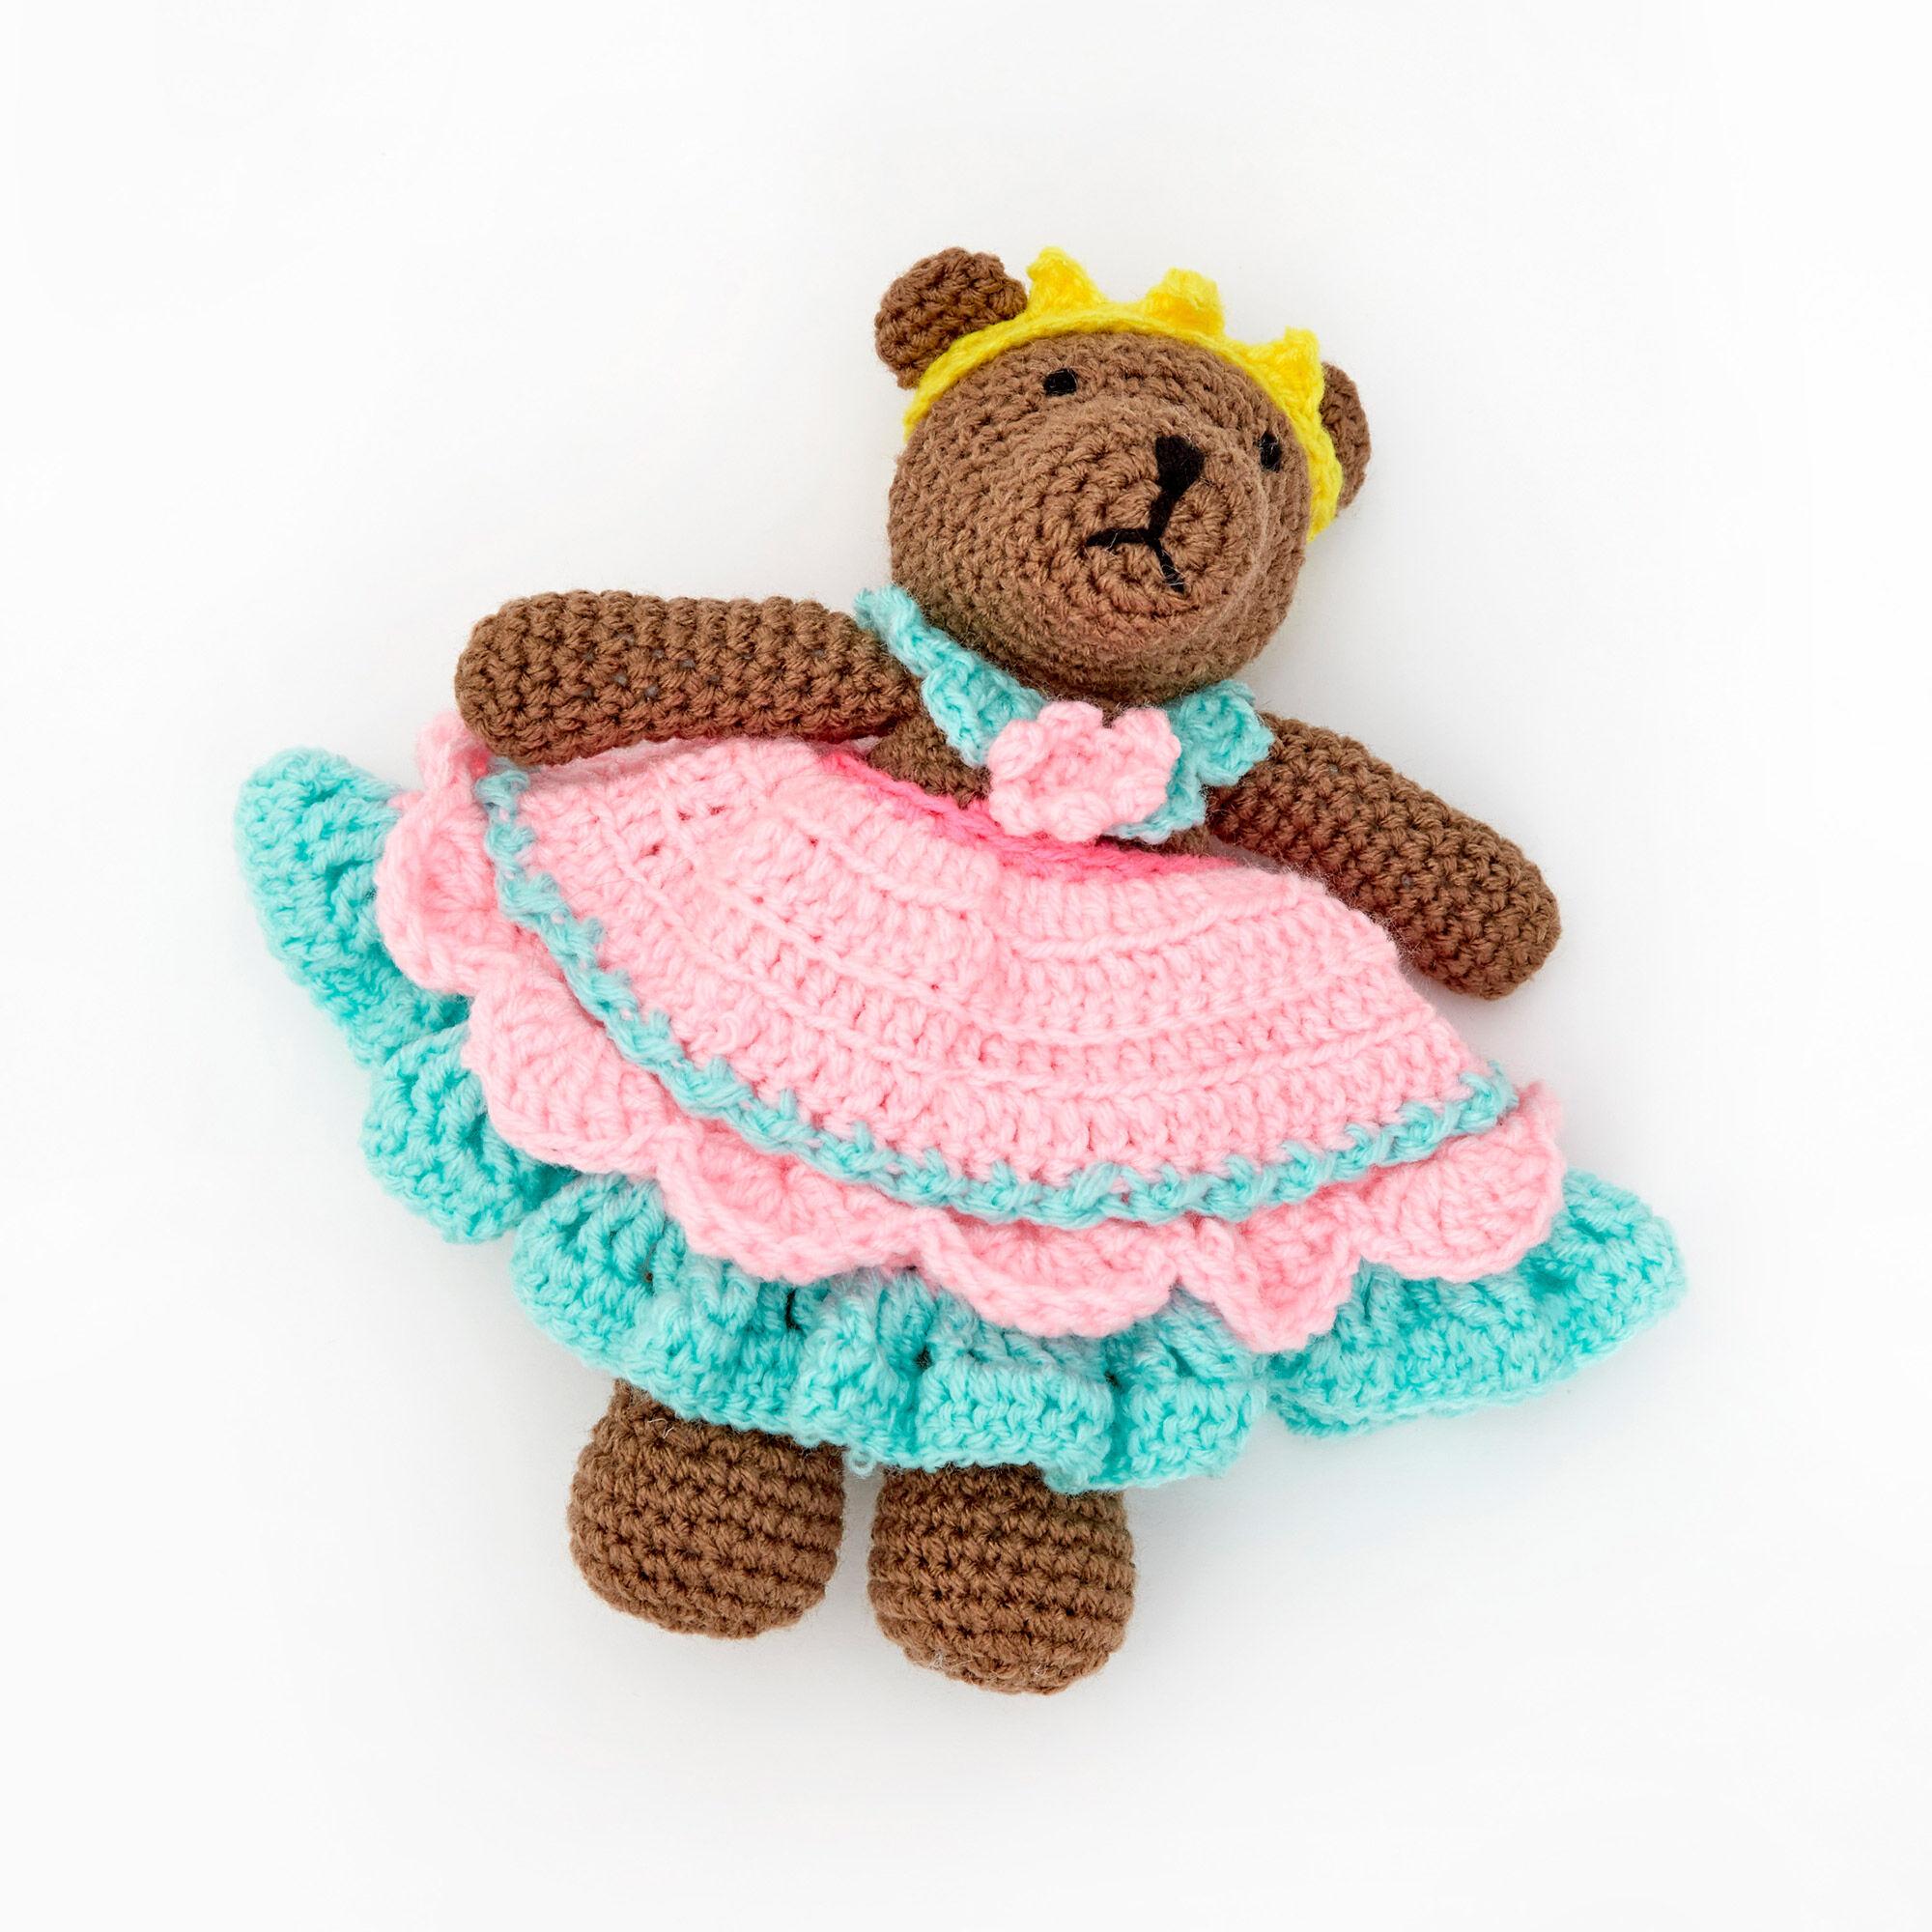 Baby Teddy Bear And Blanket Set Crochet Patterns   2000x2000